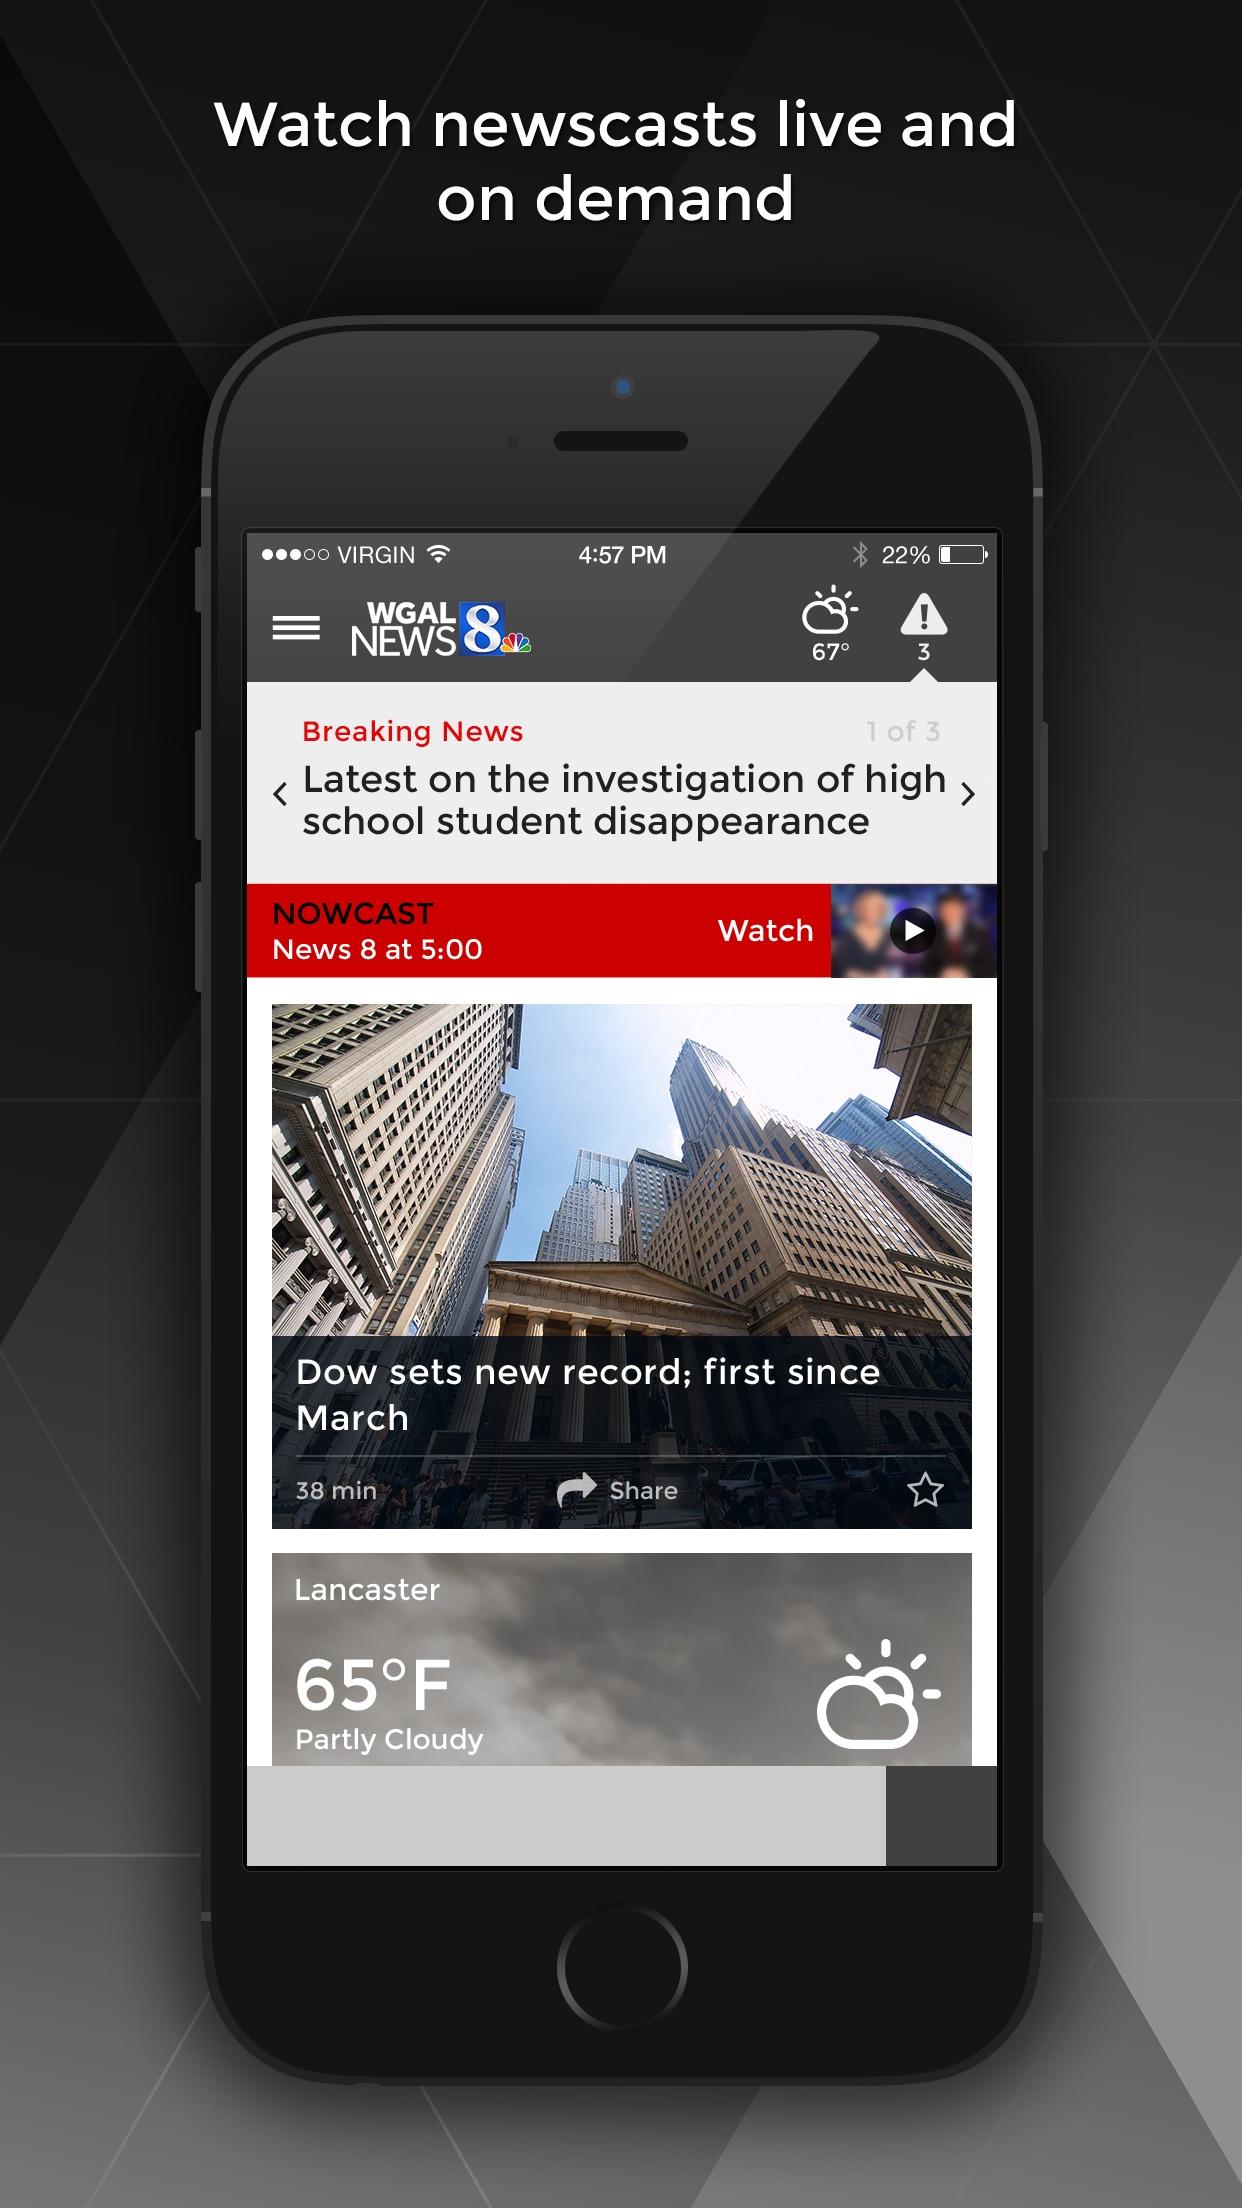 WGAL News 8 - Susquehanna Valley news and weather Screenshot